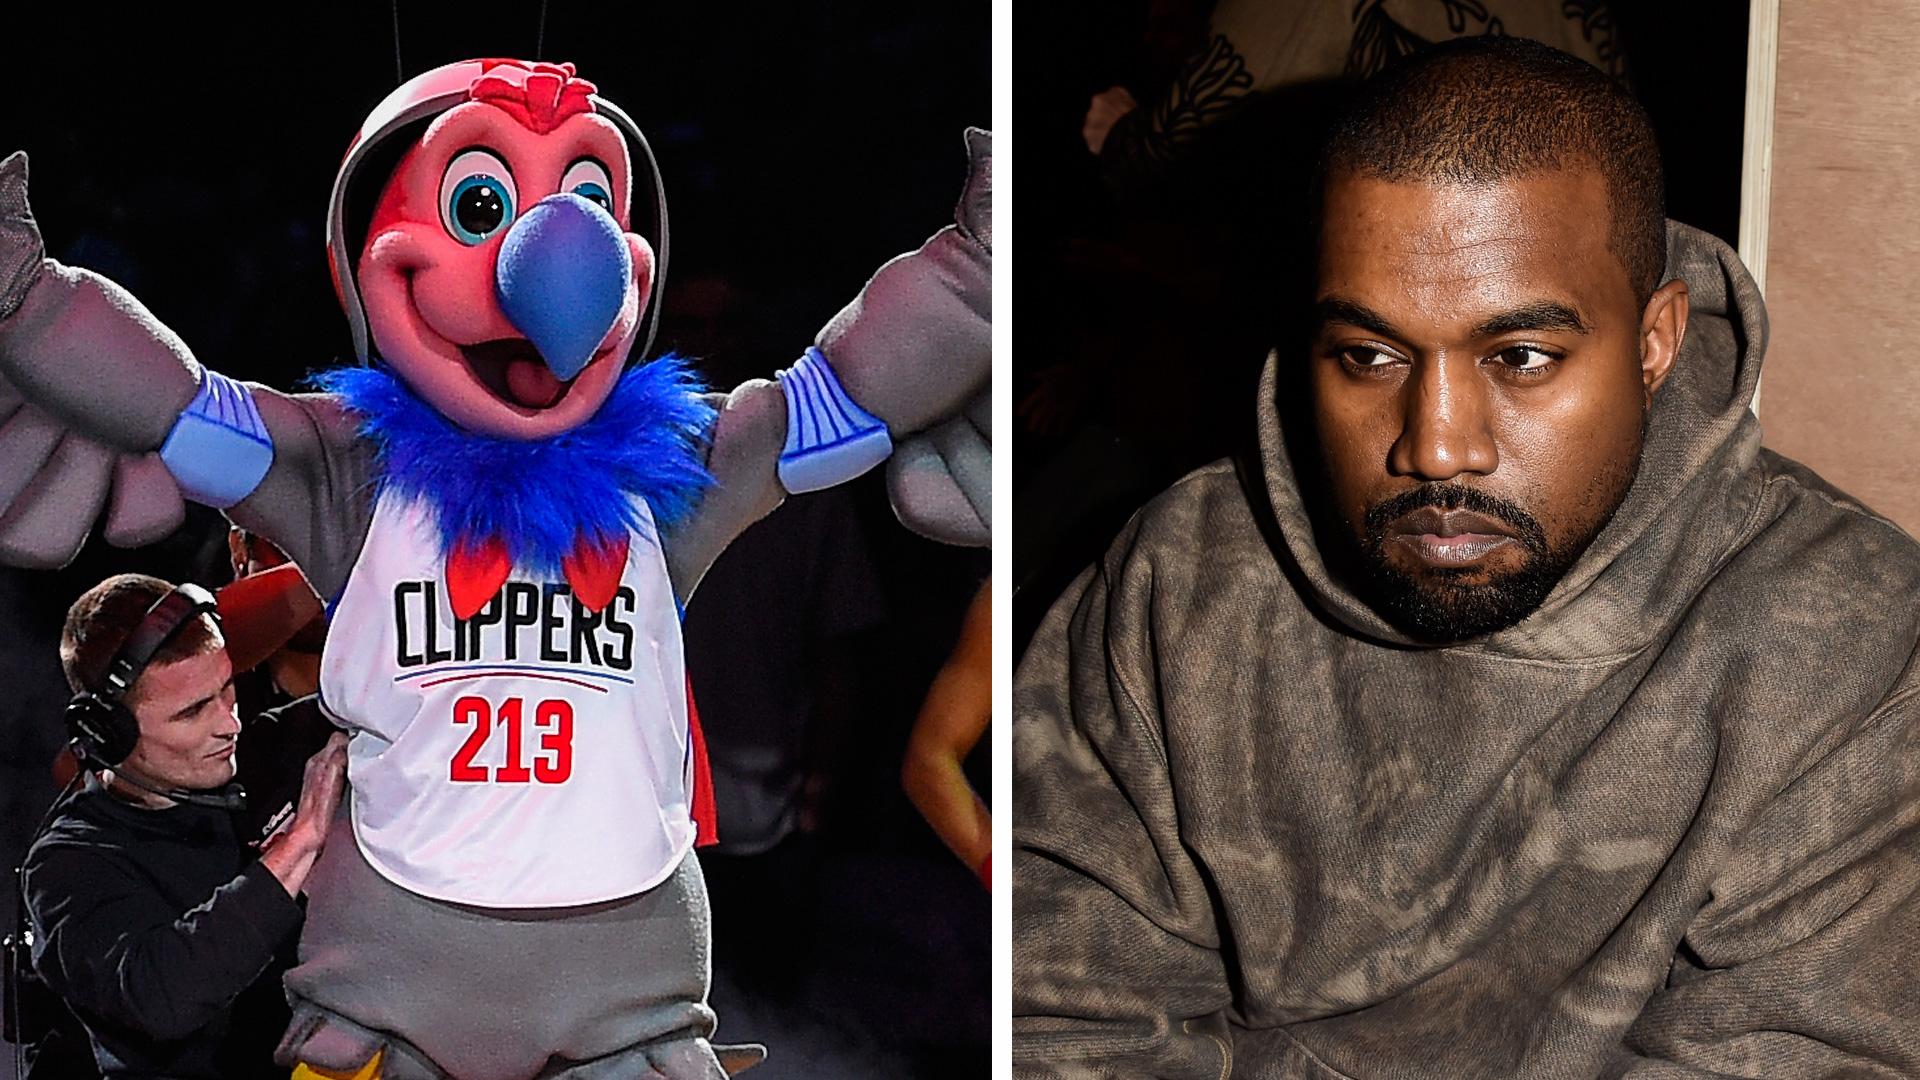 SPLIT-Kanye-West-Clippers-Mascot-031316-AP-GETTY-FTR.jpg